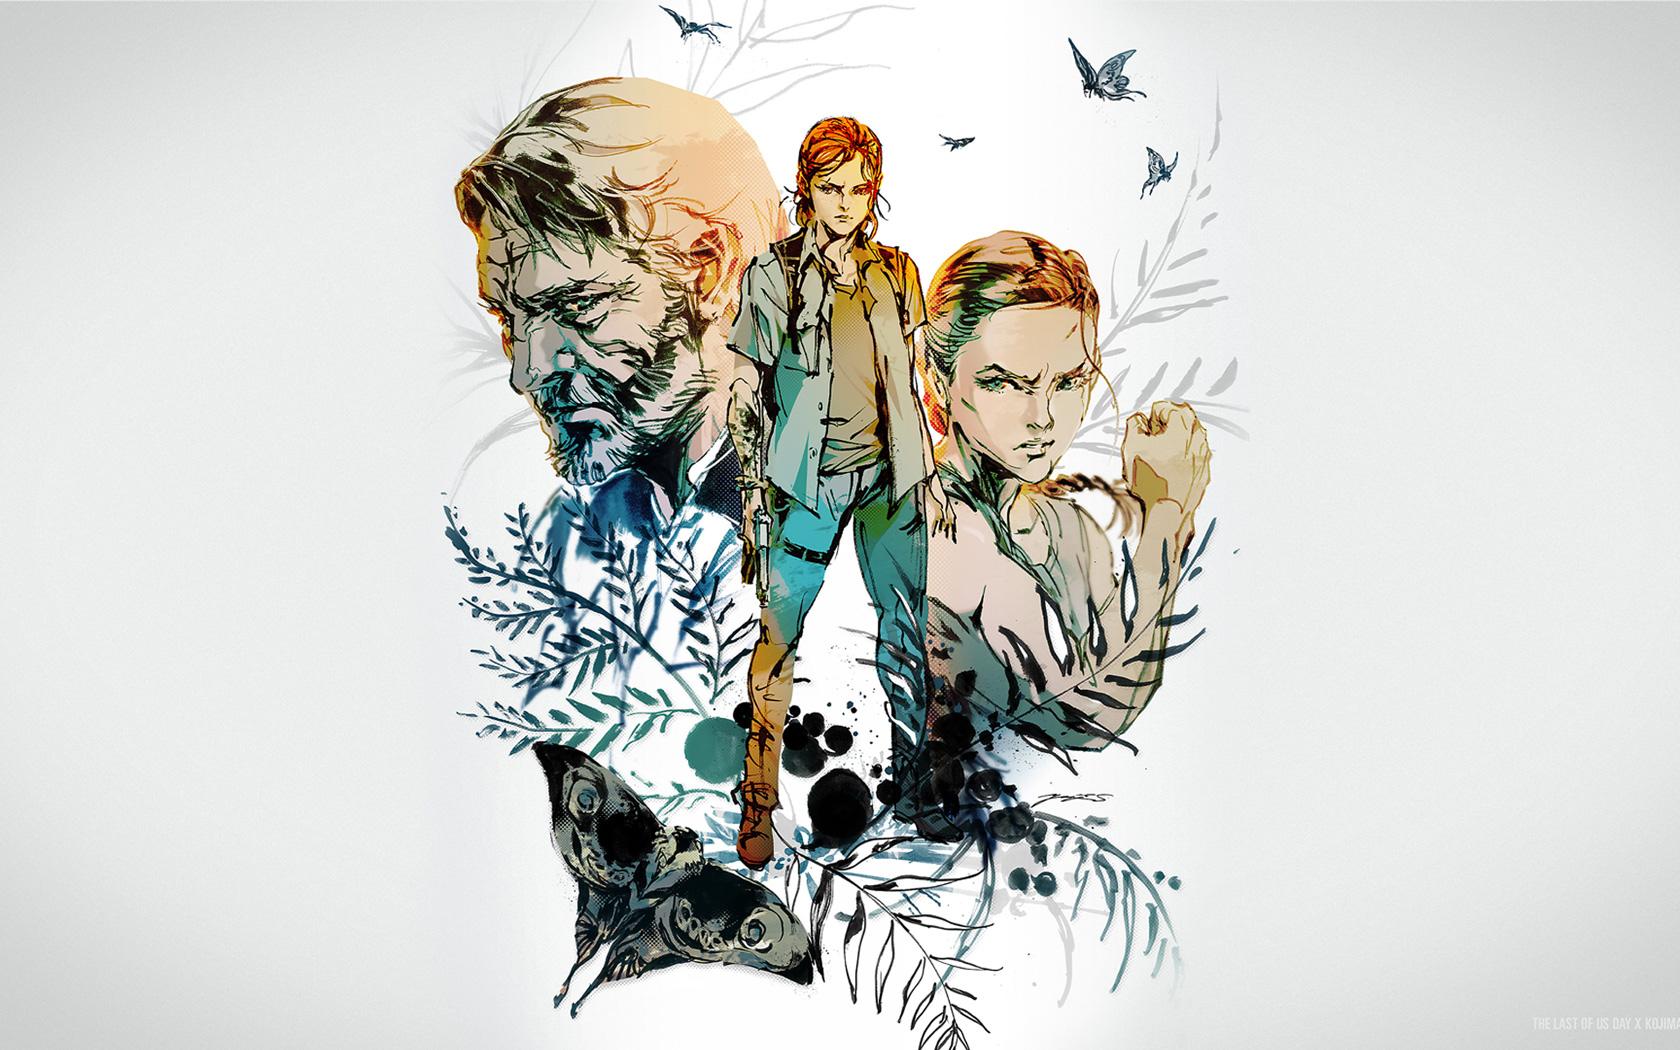 Free The Last of Us Part II Wallpaper in 1680x1050